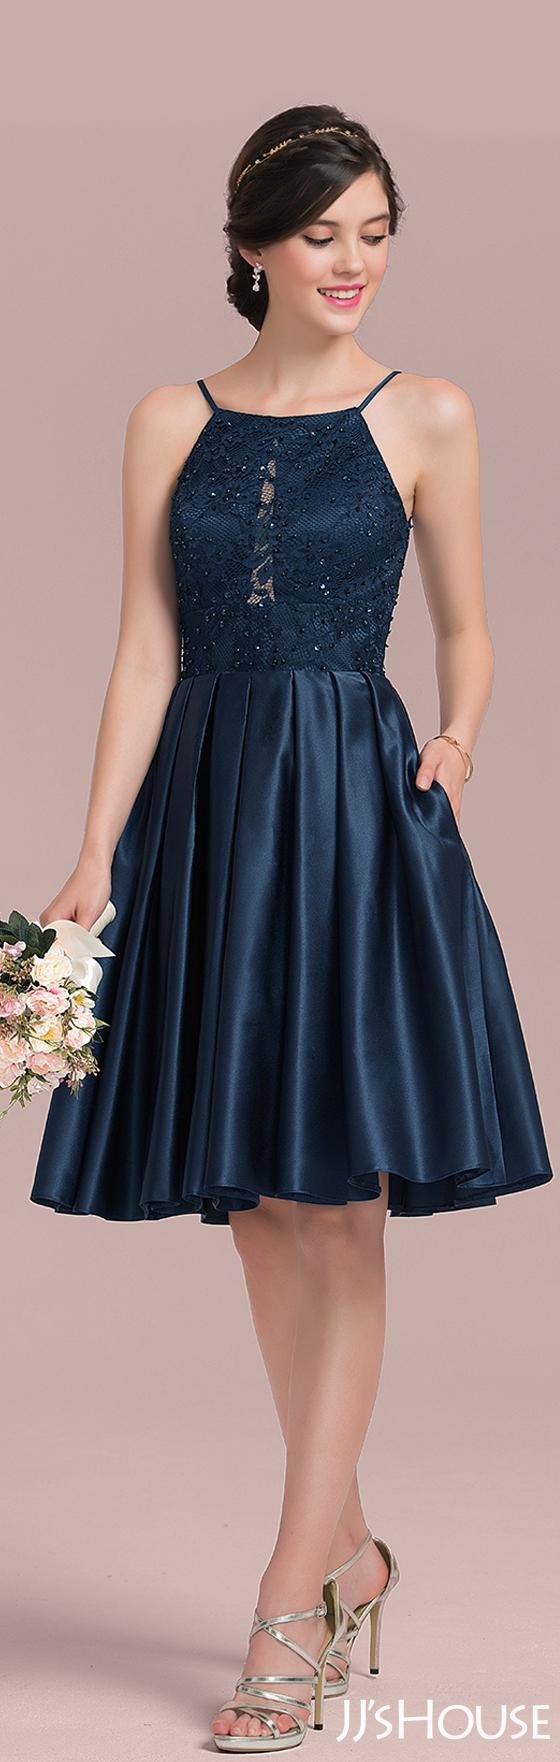 Modern and classic bridesmaid dress! #JJsHouse # Bridesmaid